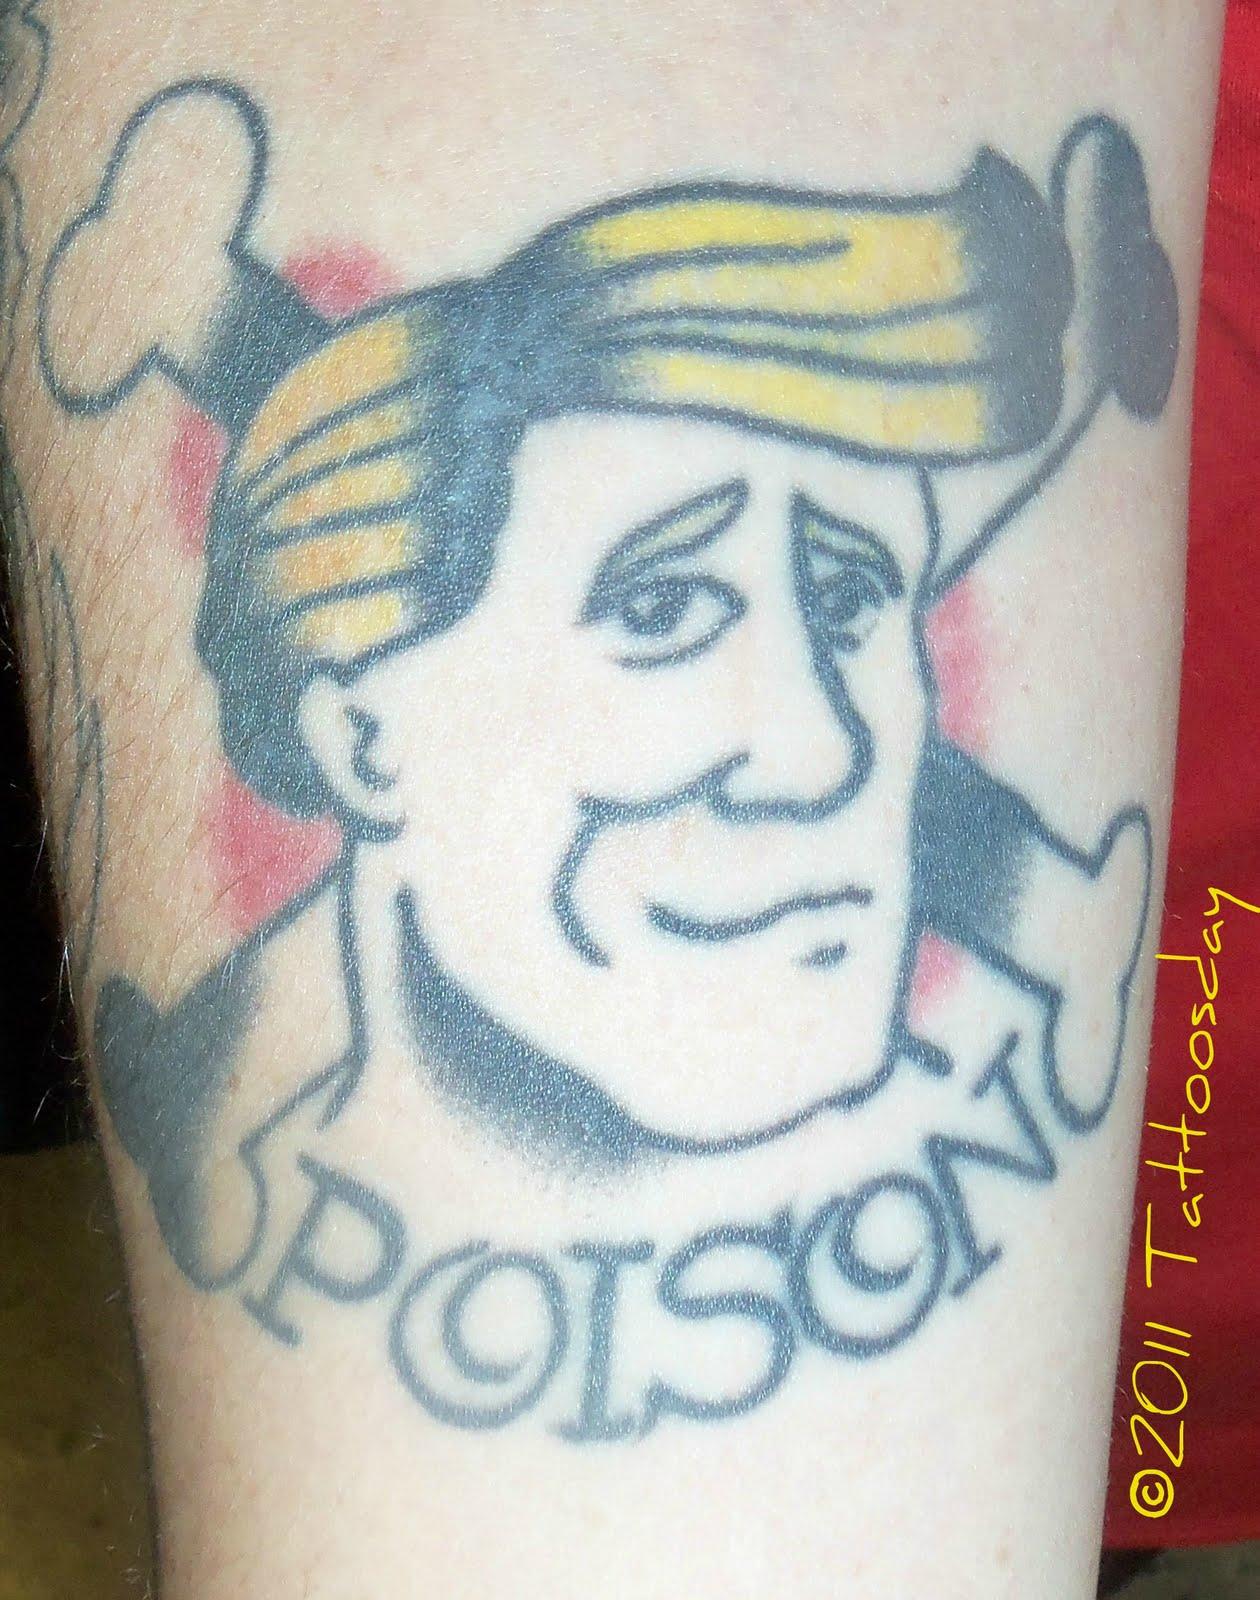 http://3.bp.blogspot.com/-q2PVHDcBhBg/TlW6KZWWj4I/AAAAAAAALro/hbZ5vvLGKYc/s1600/Poison.jpg